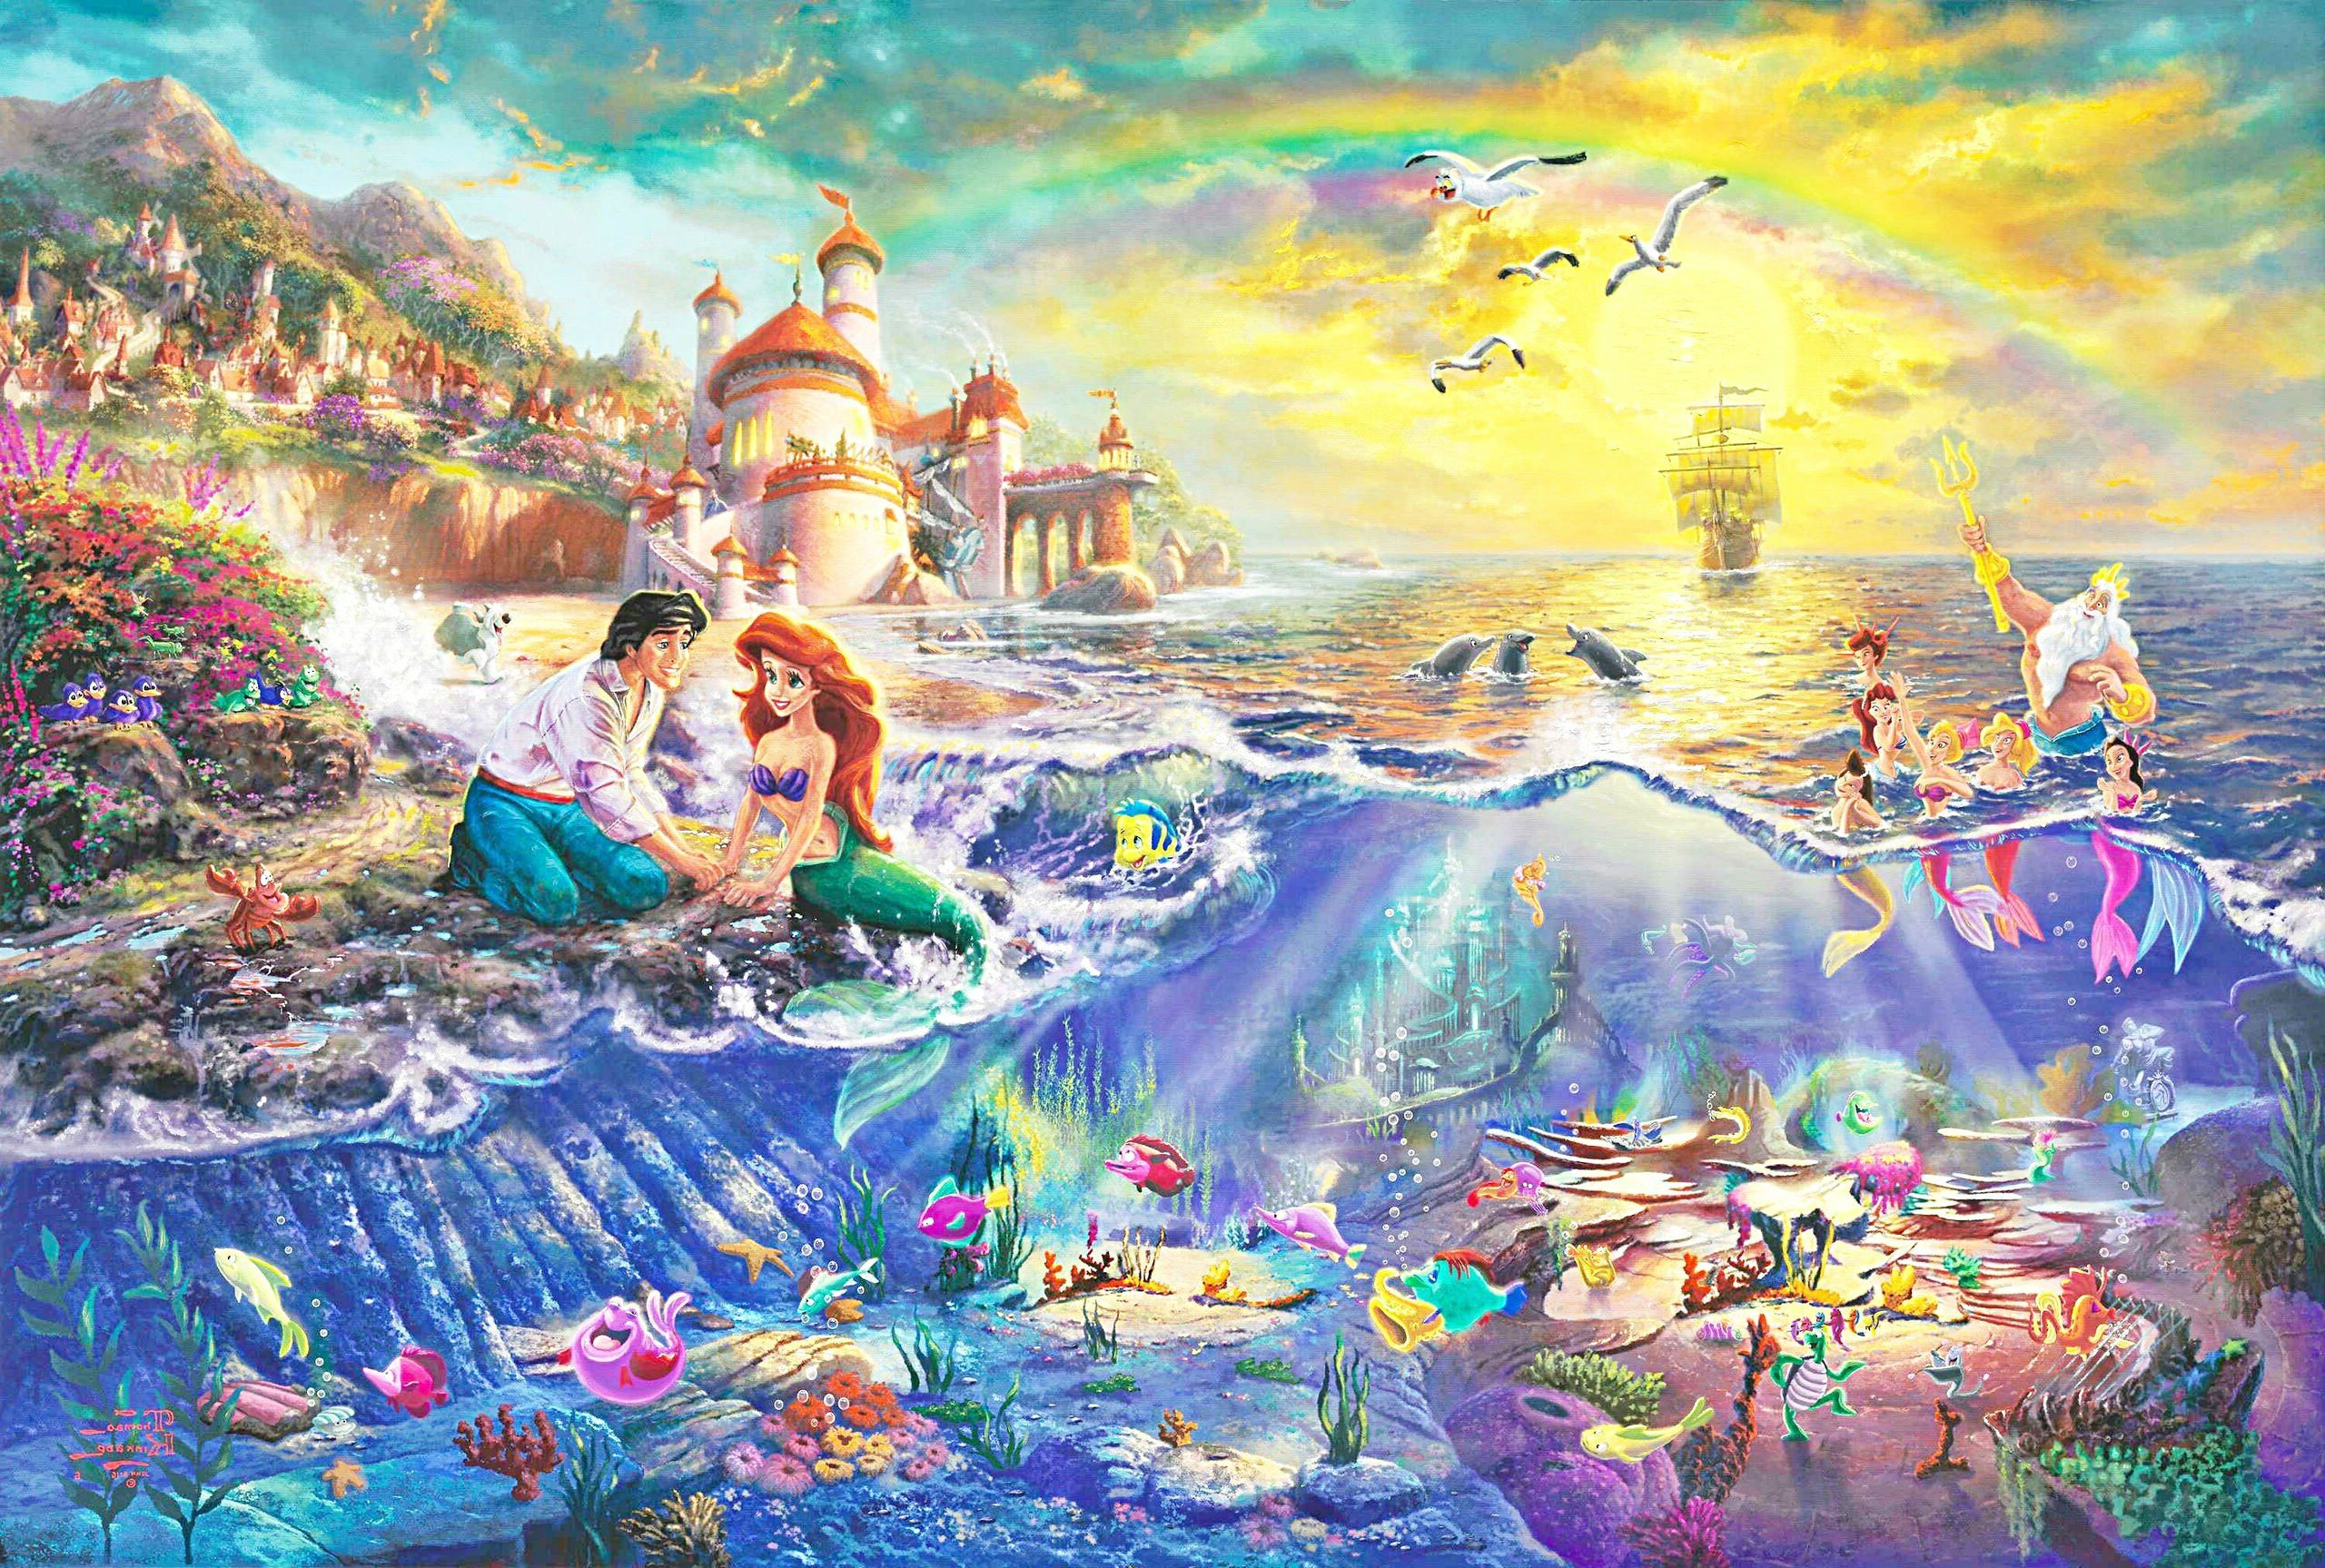 Cool Wallpaper Macbook Disney - 848663ba59bb4aadbc9fd9b79562df51  Trends_725783.jpg